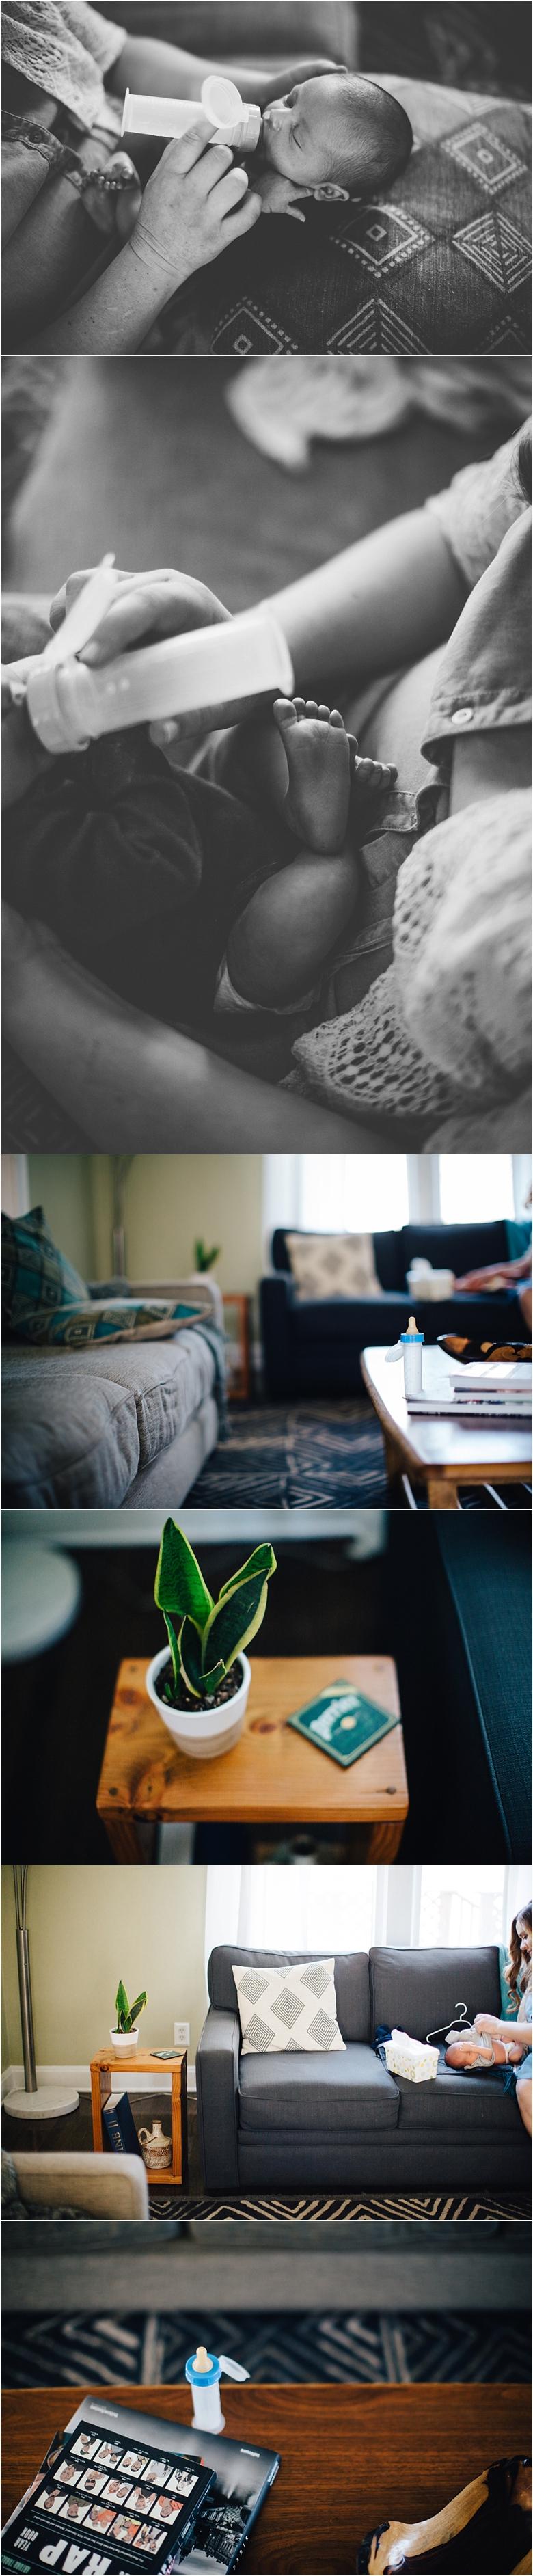 kansascitynewbornphotographer_1001